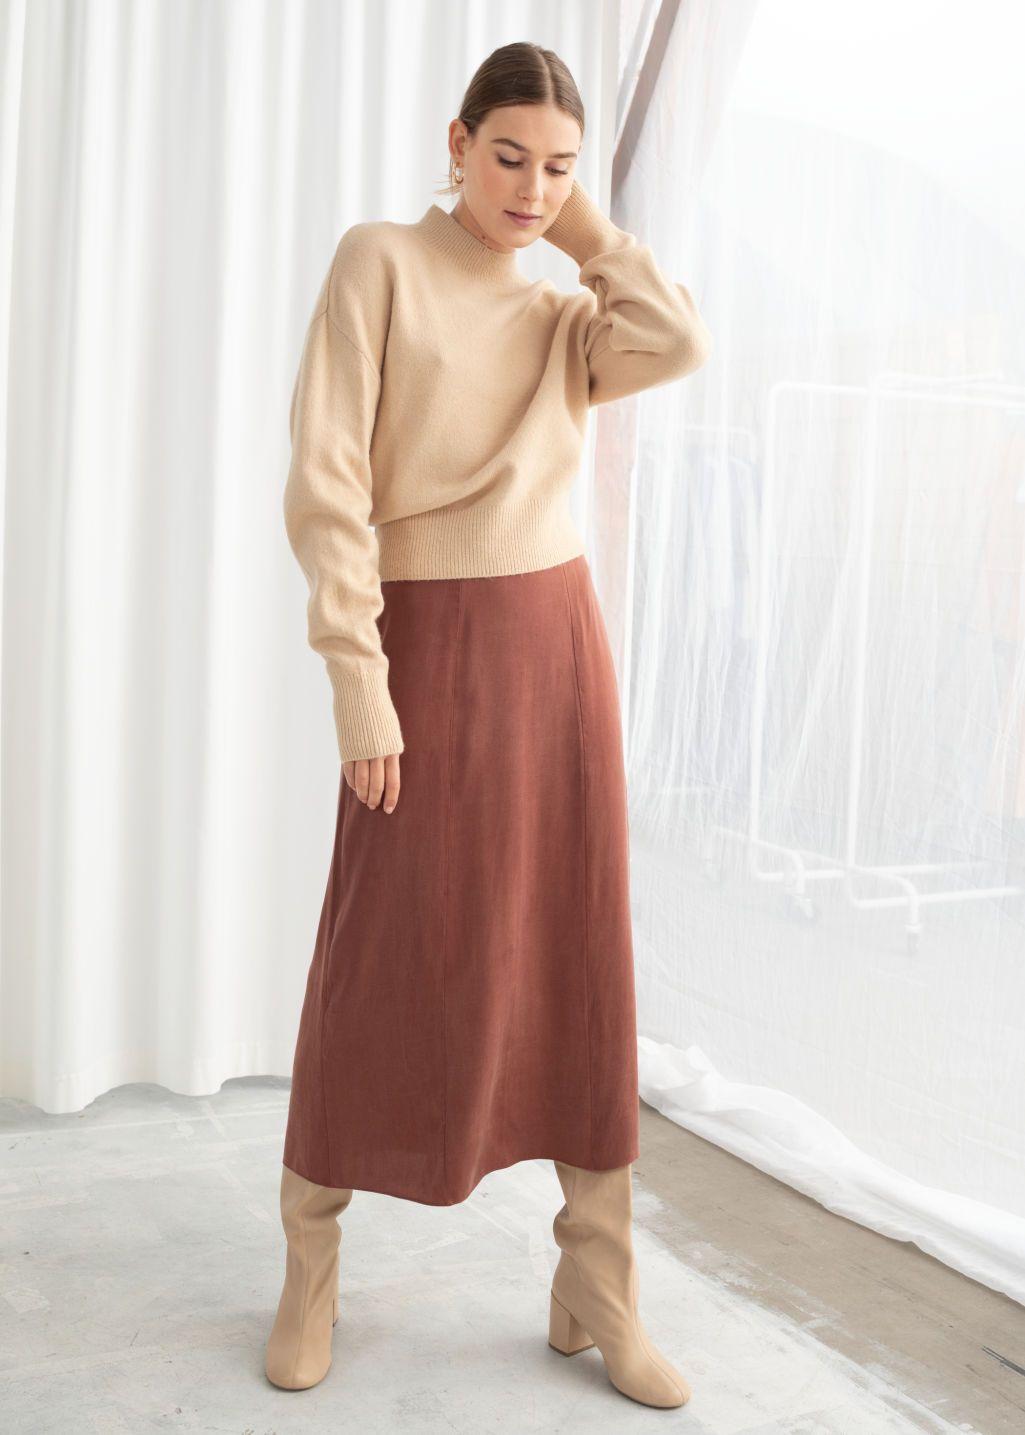 c7853fba85 A-Line Midi Skirt in 2019 | Wants | Midi skirt, Skirts, Fashion